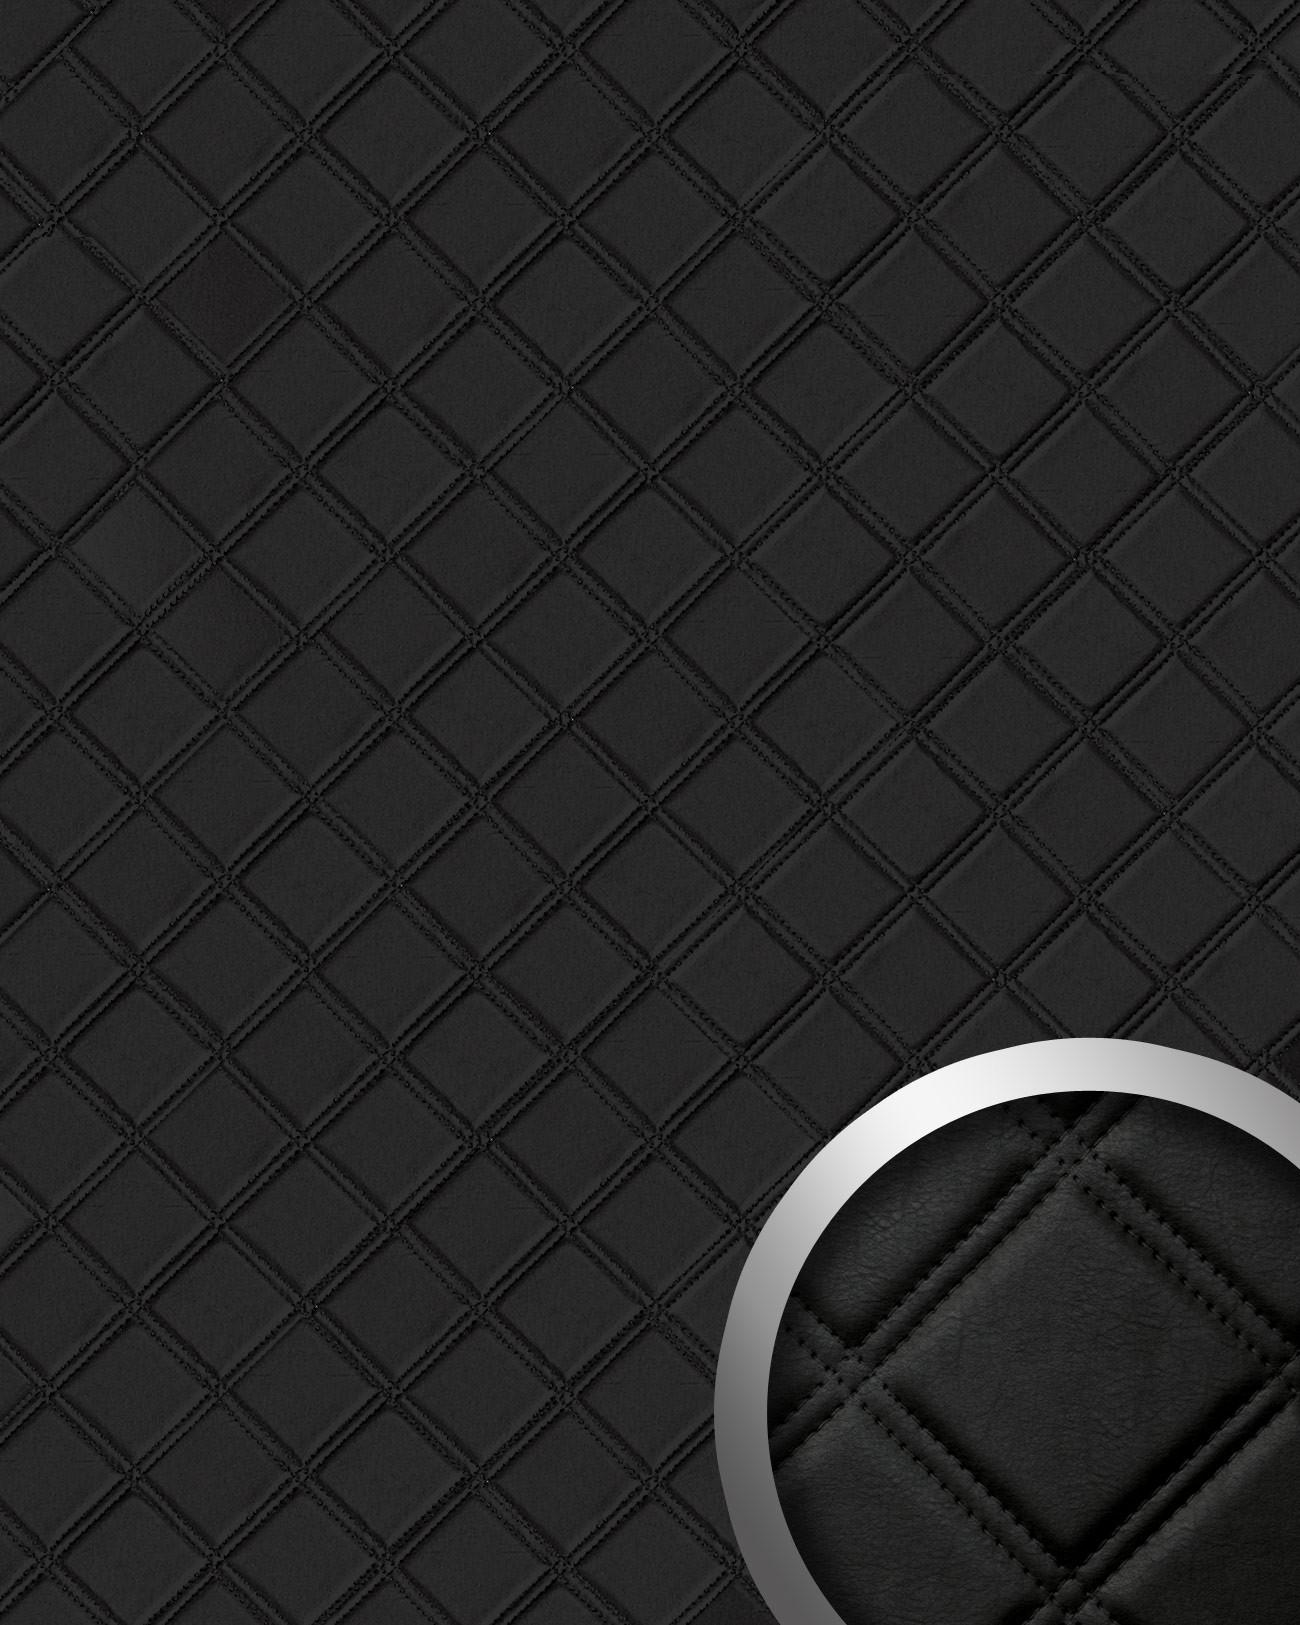 wallface 15030 rombo design wand paneel leder karo 3d dekor schwarz 2 60 qm ebay. Black Bedroom Furniture Sets. Home Design Ideas